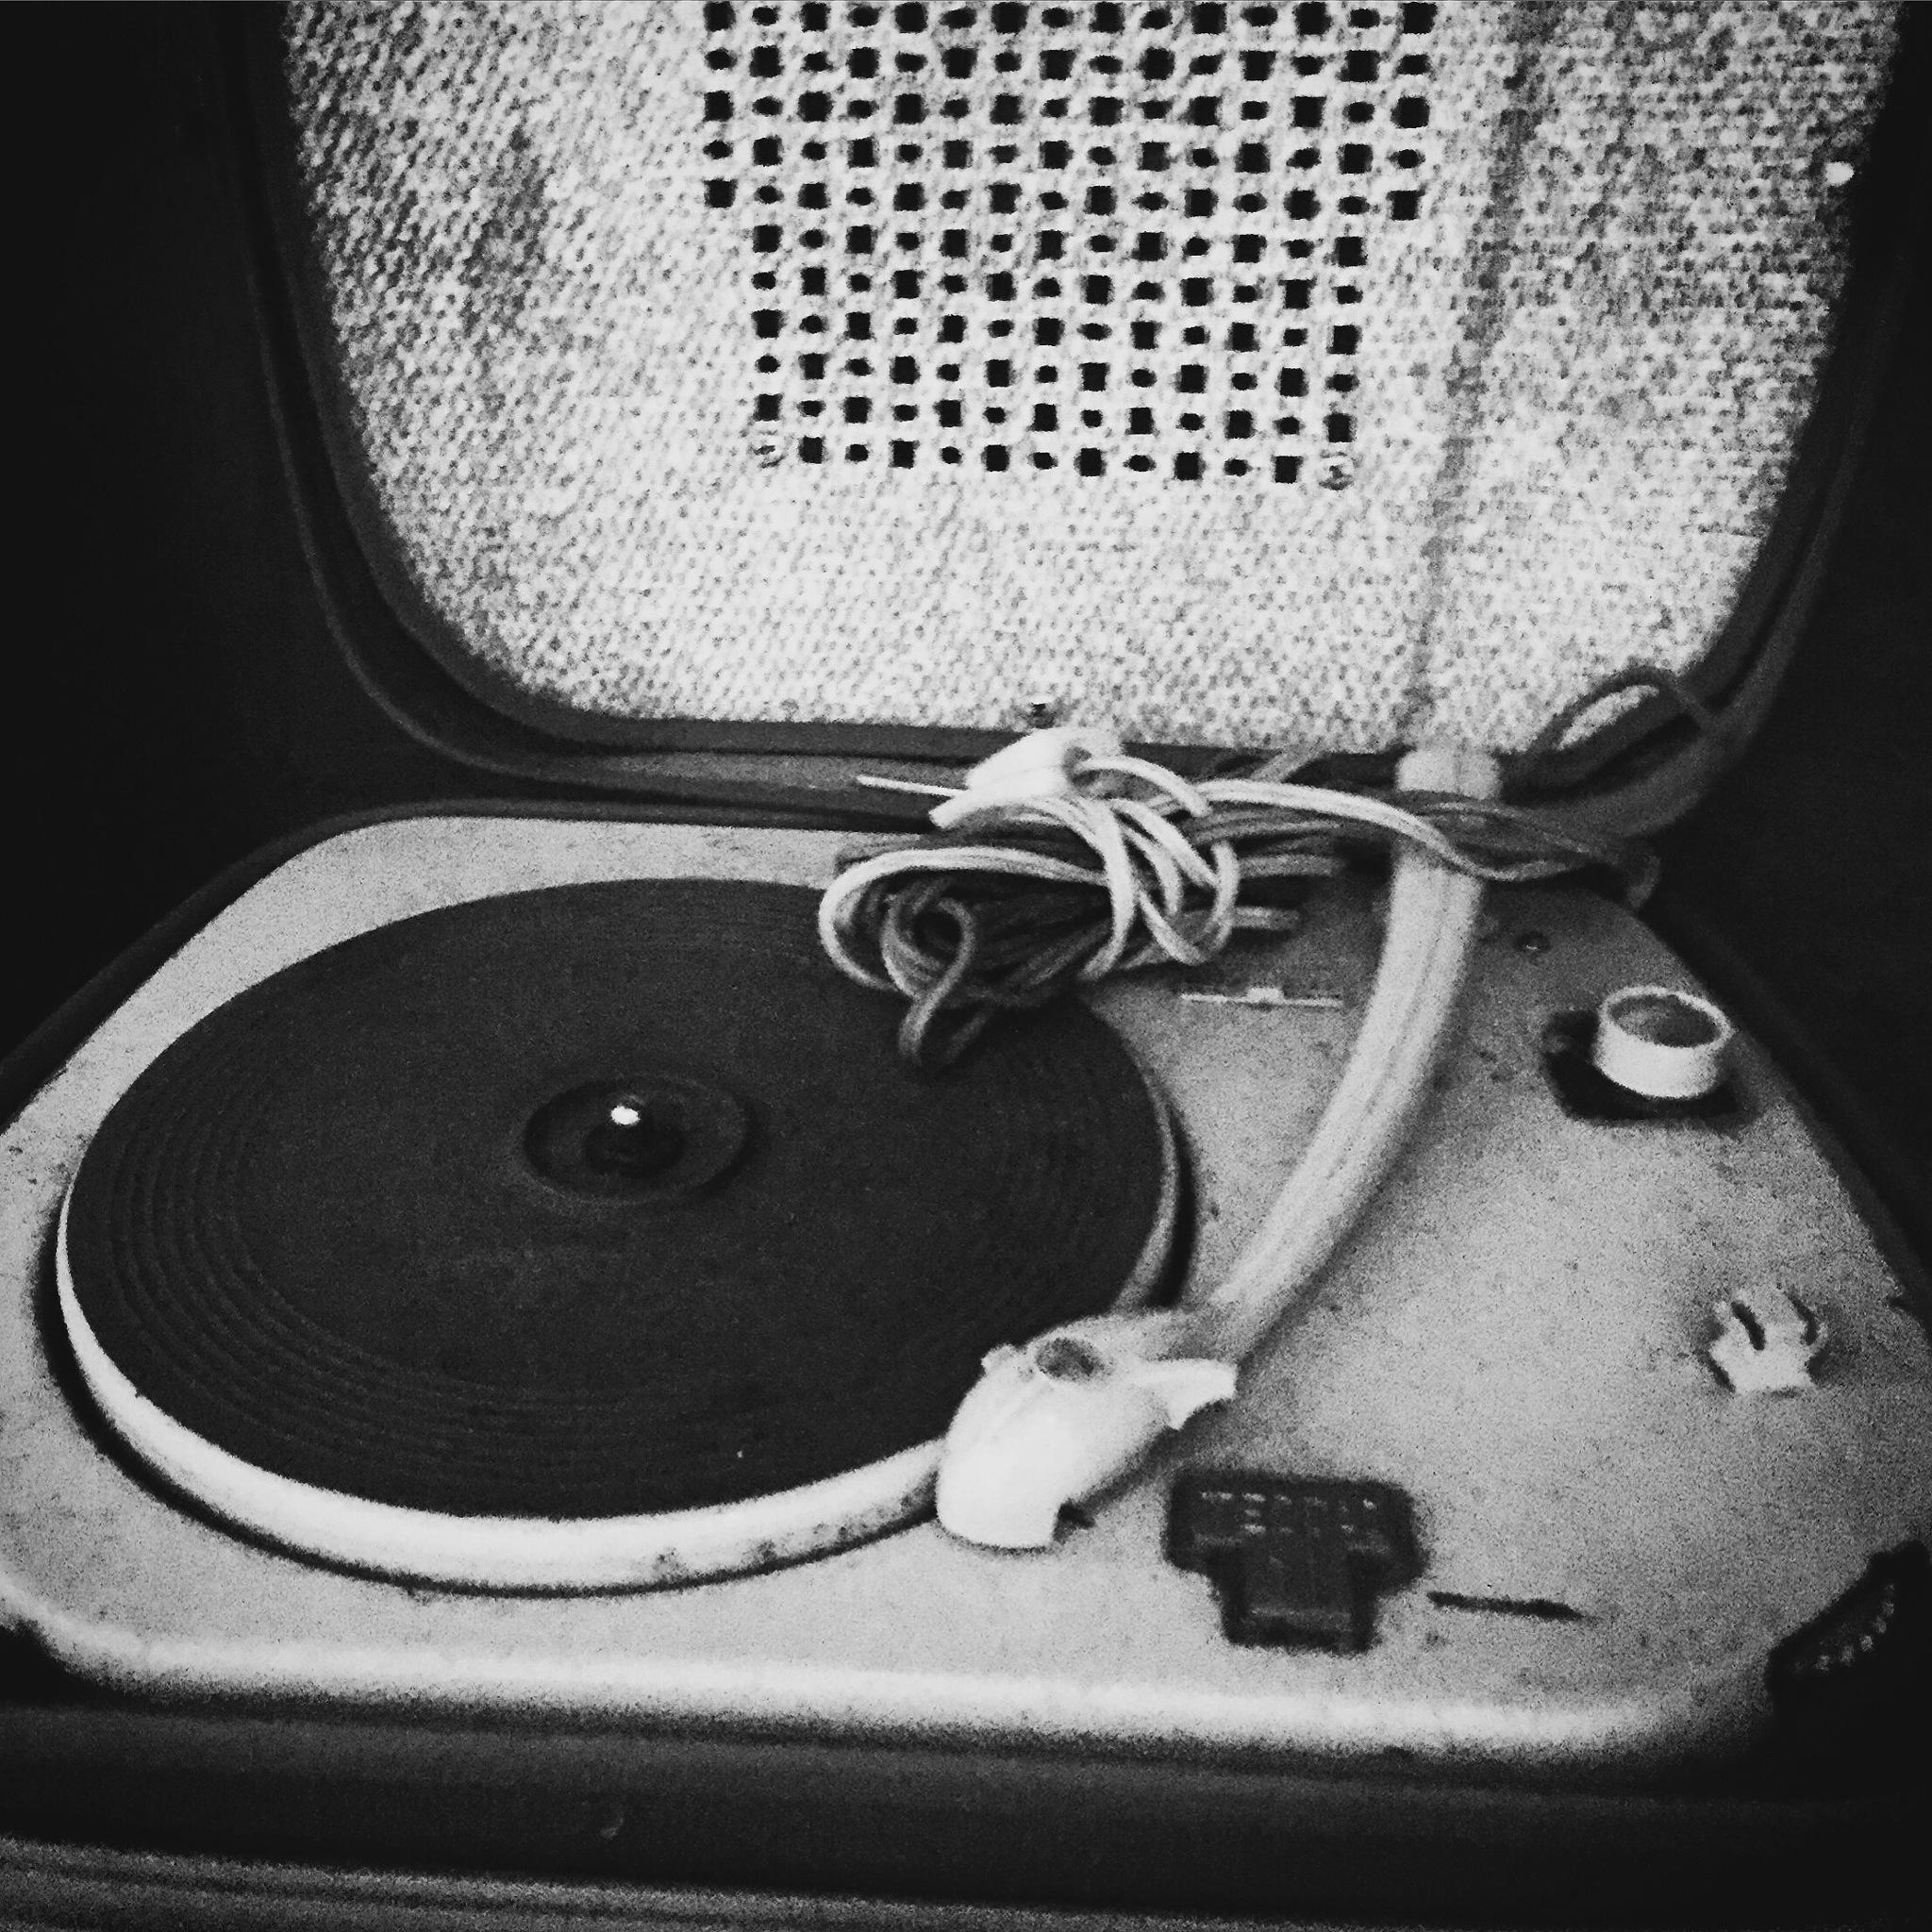 437 by George Best